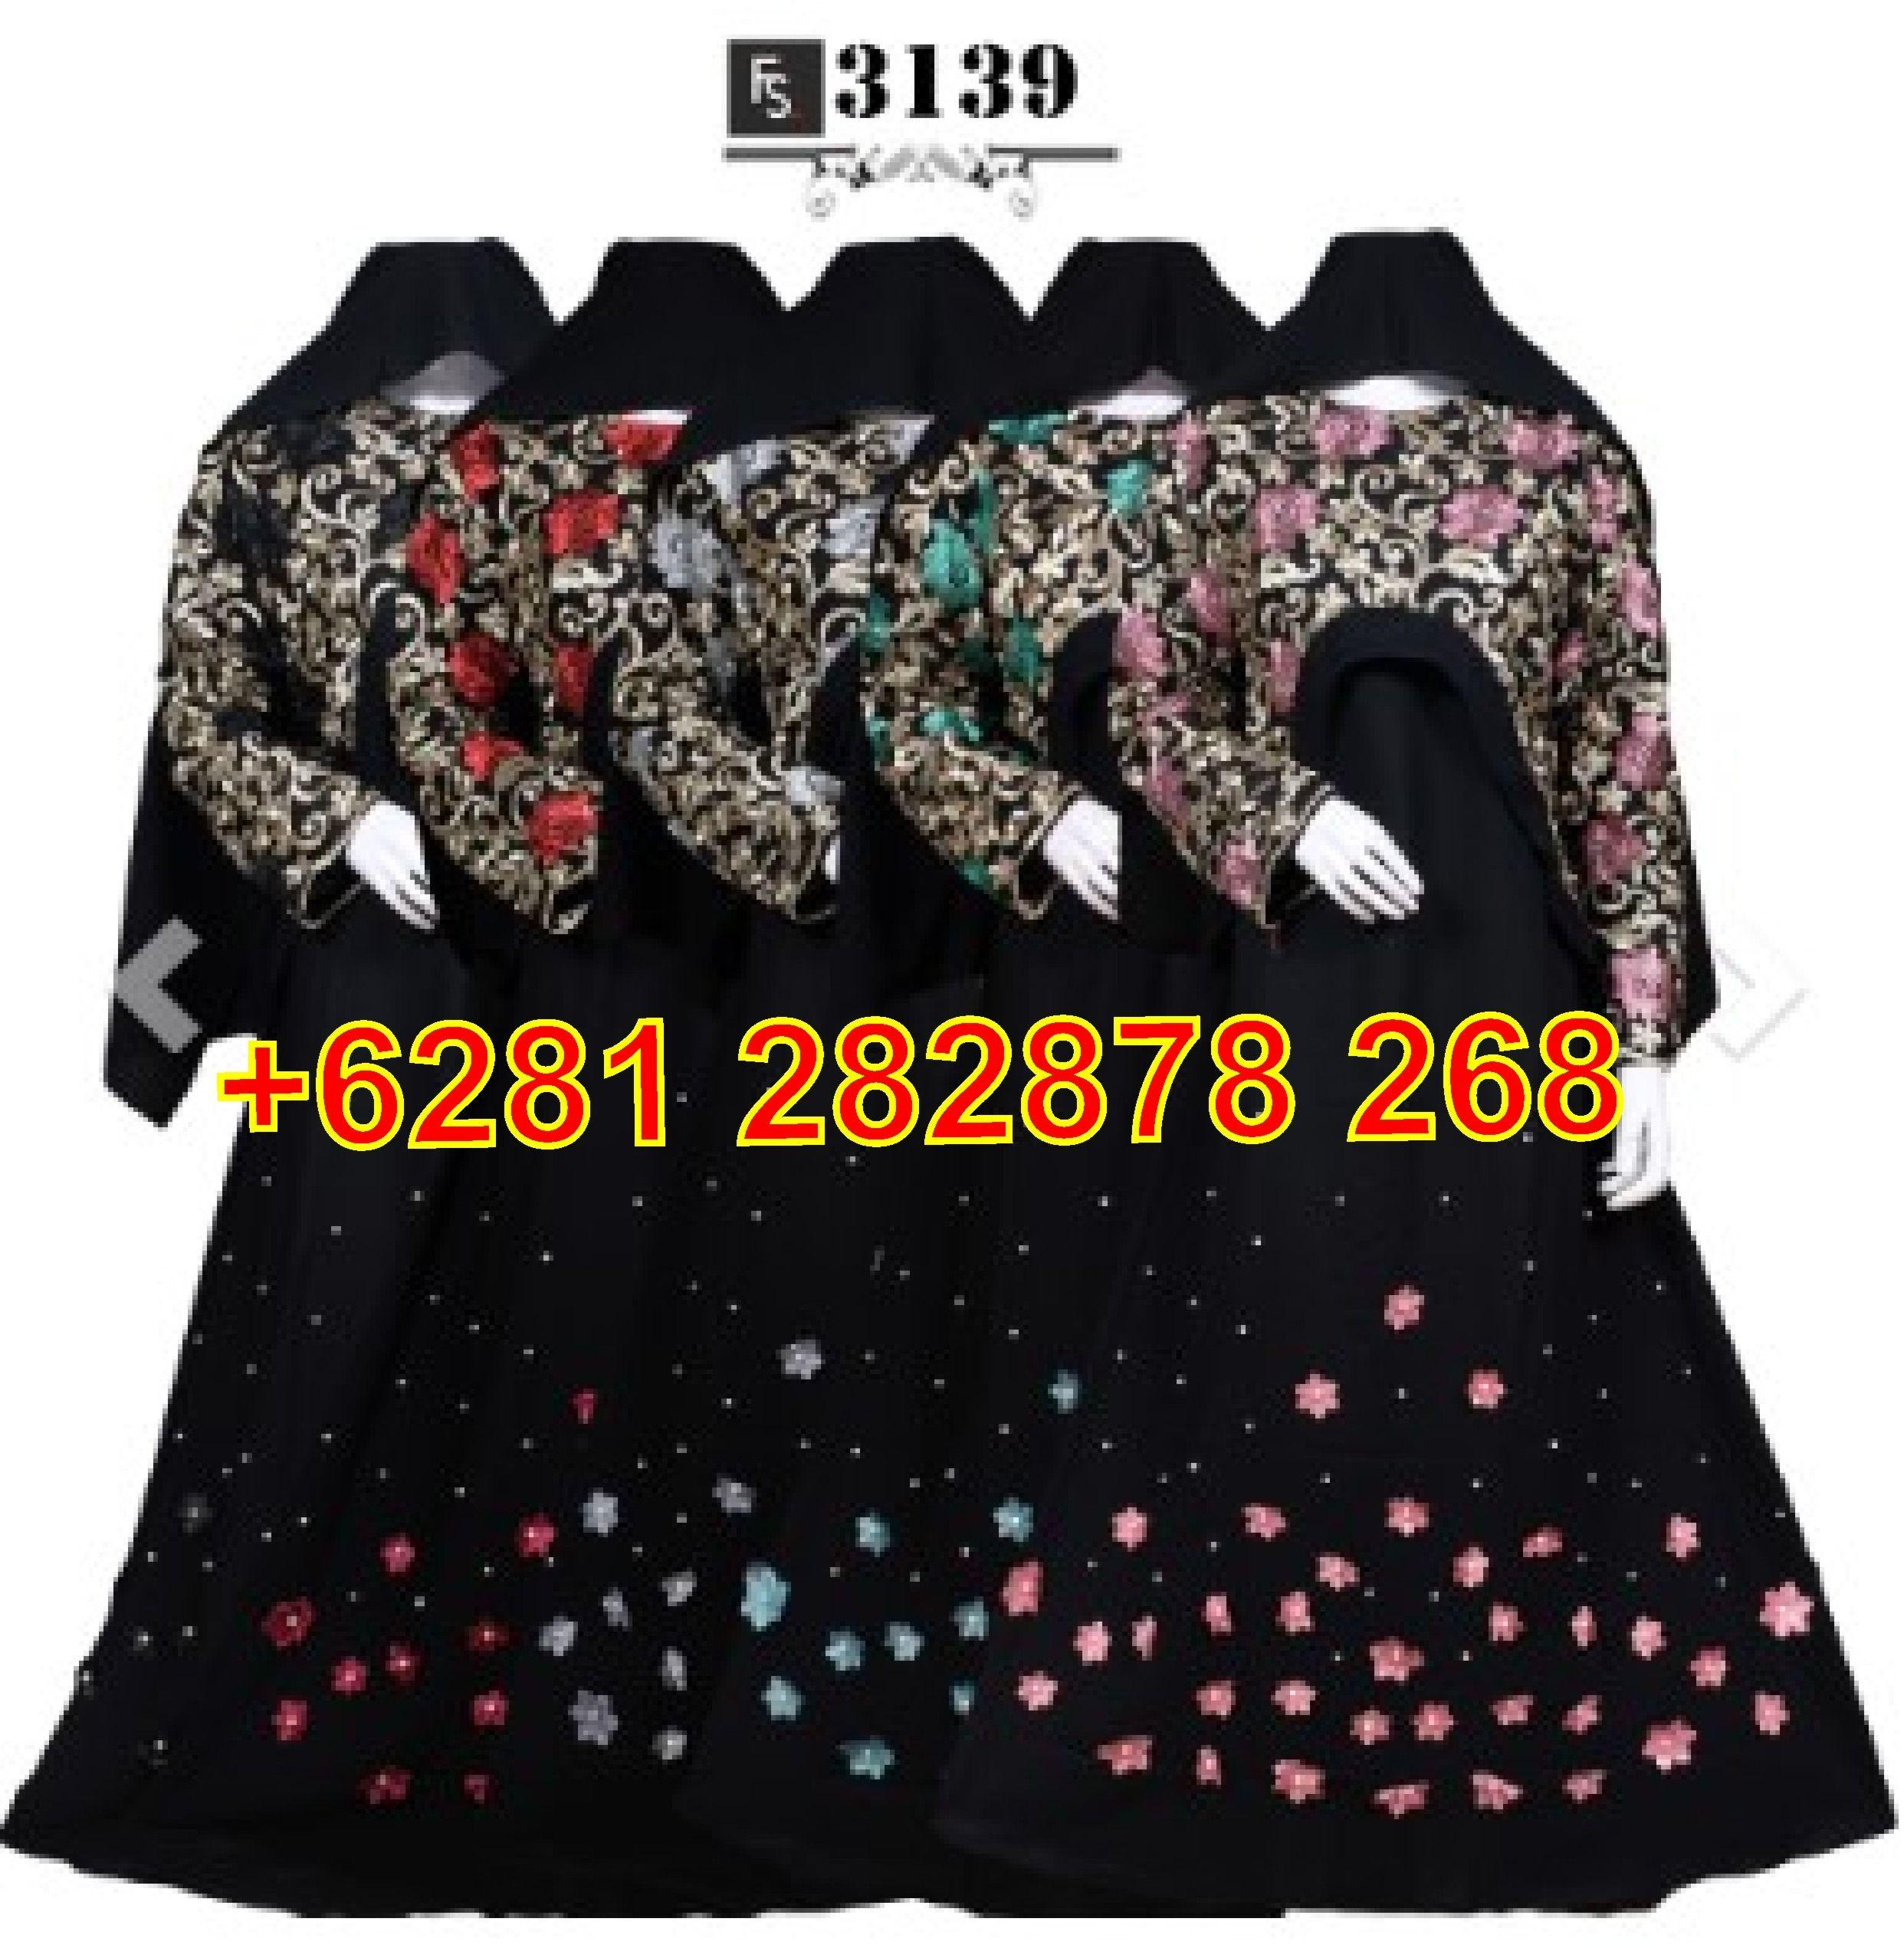 6281 282878 268 انستقرام عبايات الرياض عبايات ملونه ساده عبايات جدة انستقرام عبايات كتف Fashion Sequin Skirt Sequins